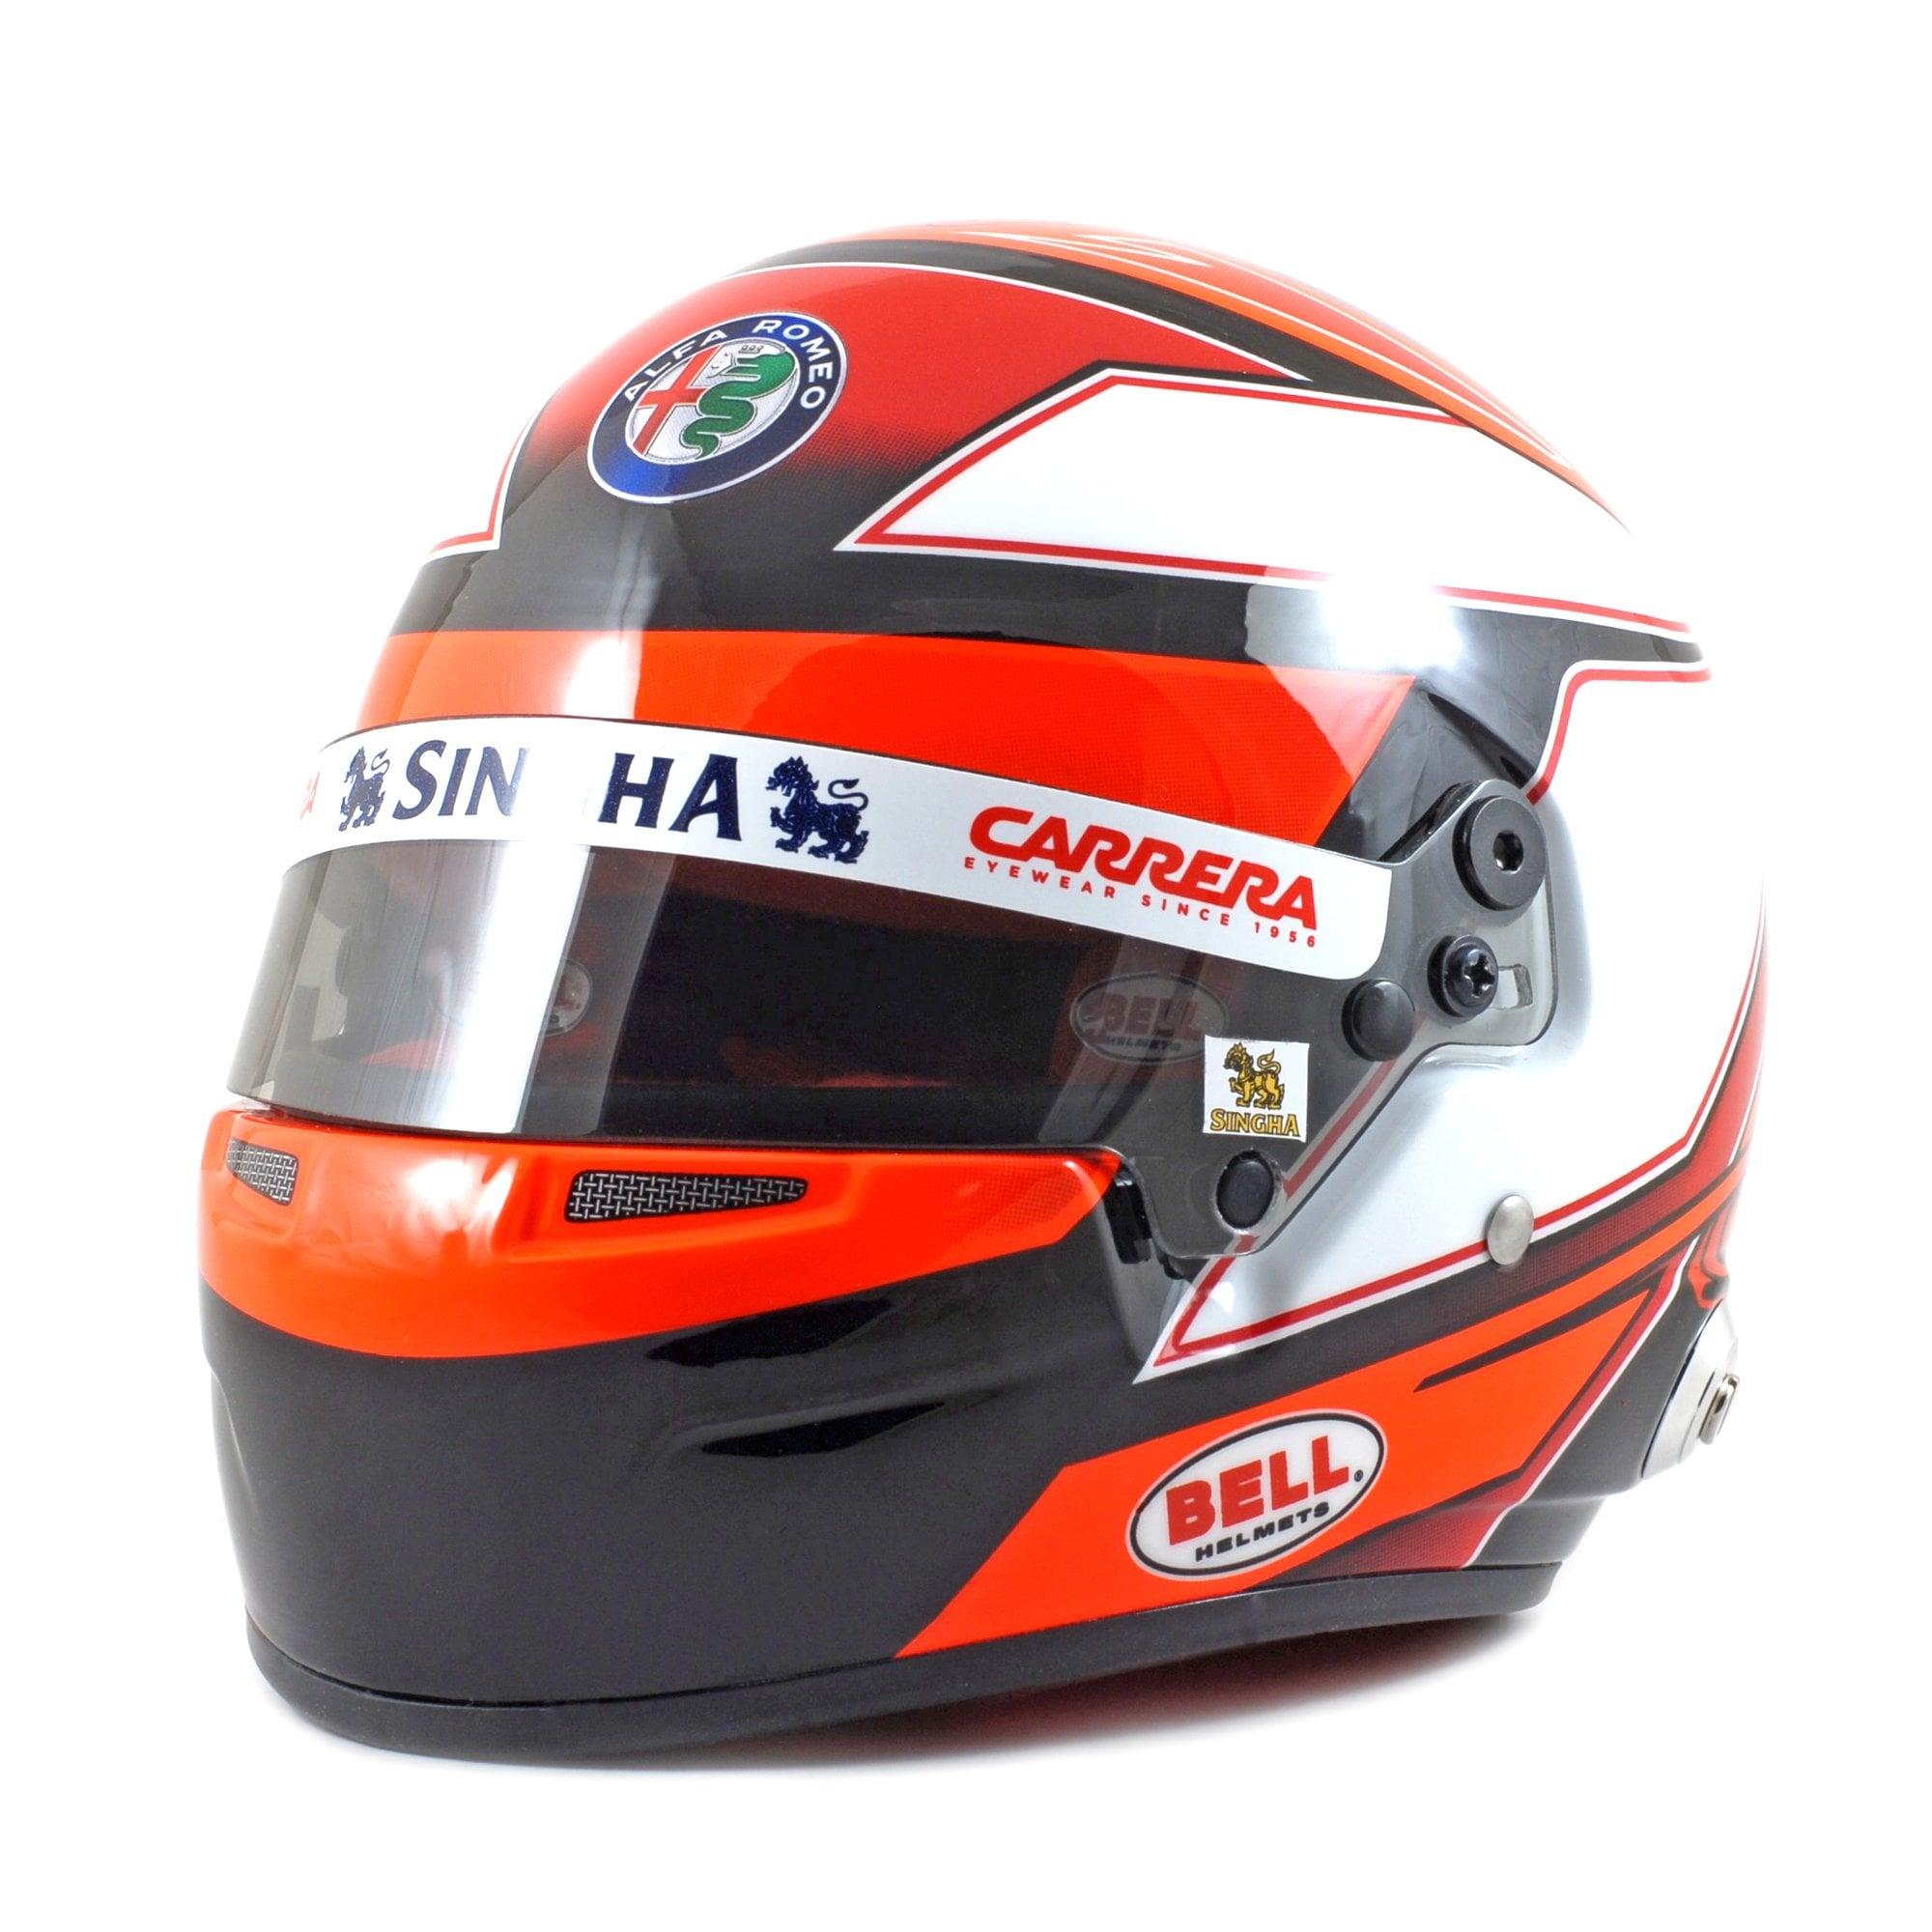 1:8 Spark Alfa Romeo Racing Helmet raikkonen 2019